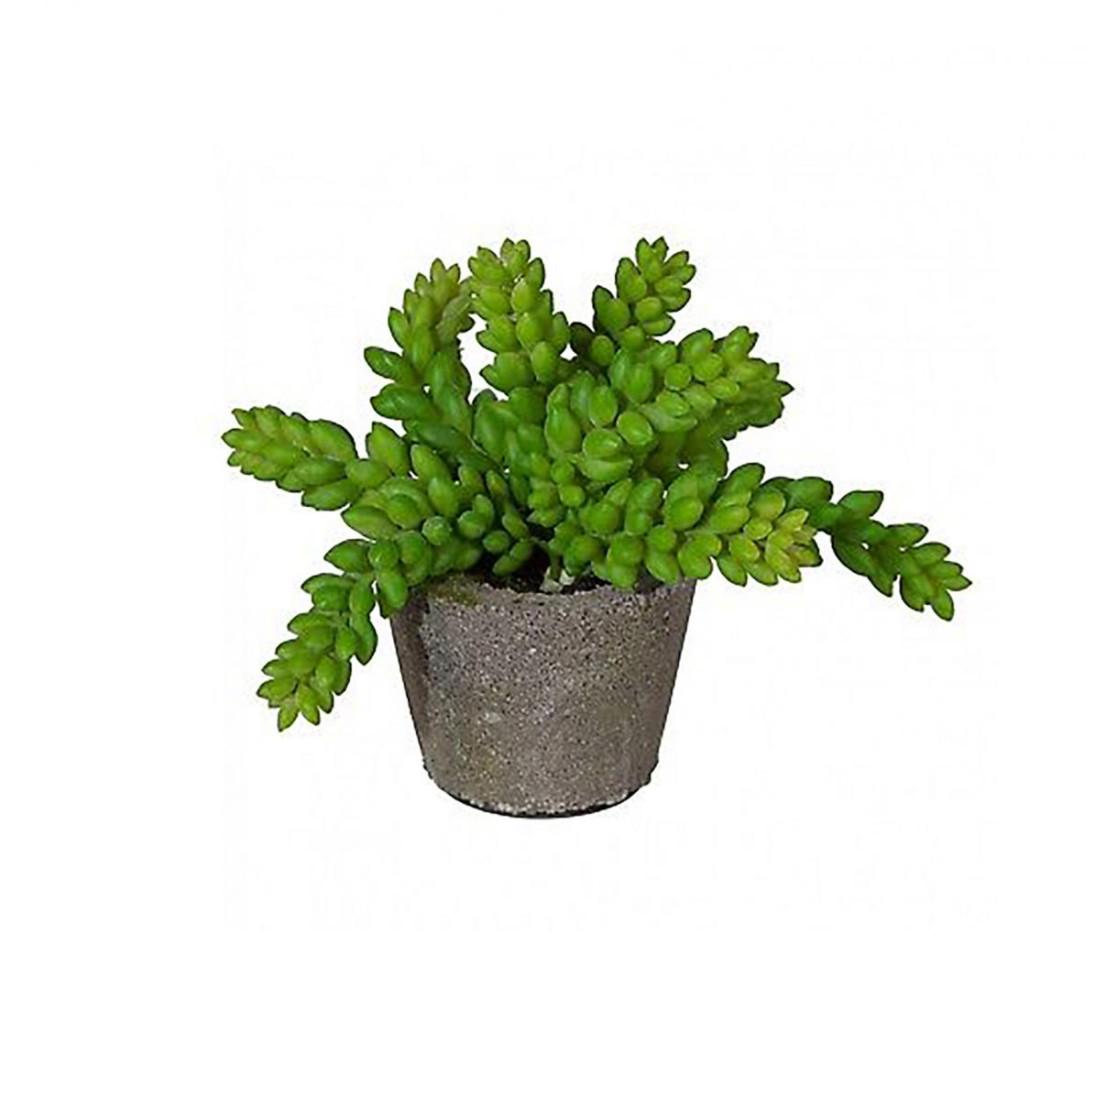 künstliche Sukkulente Grünpflanze Pflanze Kunstpflanze Topf 13 cm 335645-50 F76